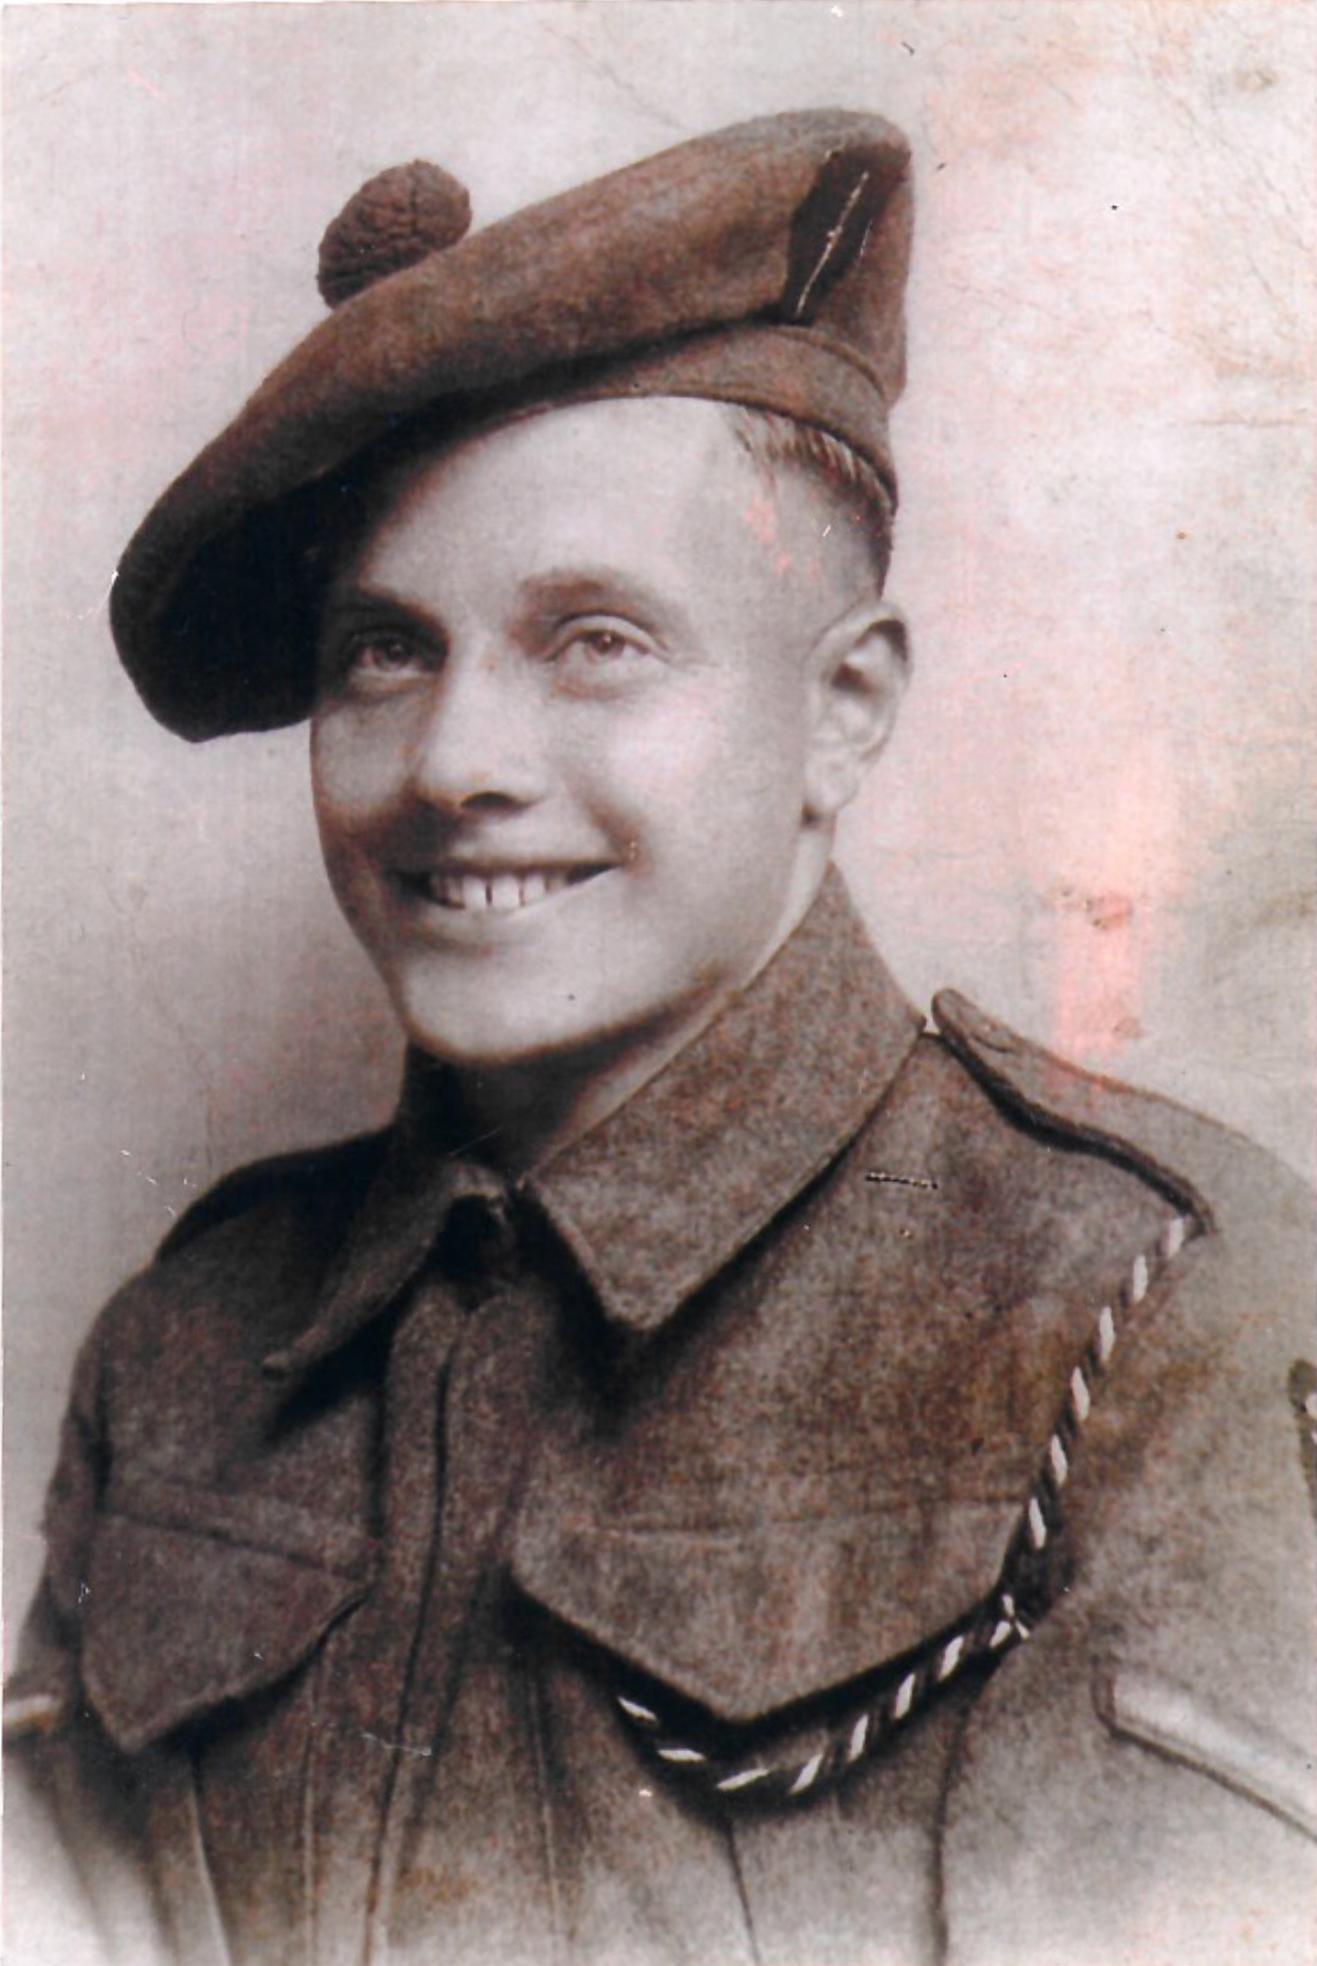 Former Commando George Parsons